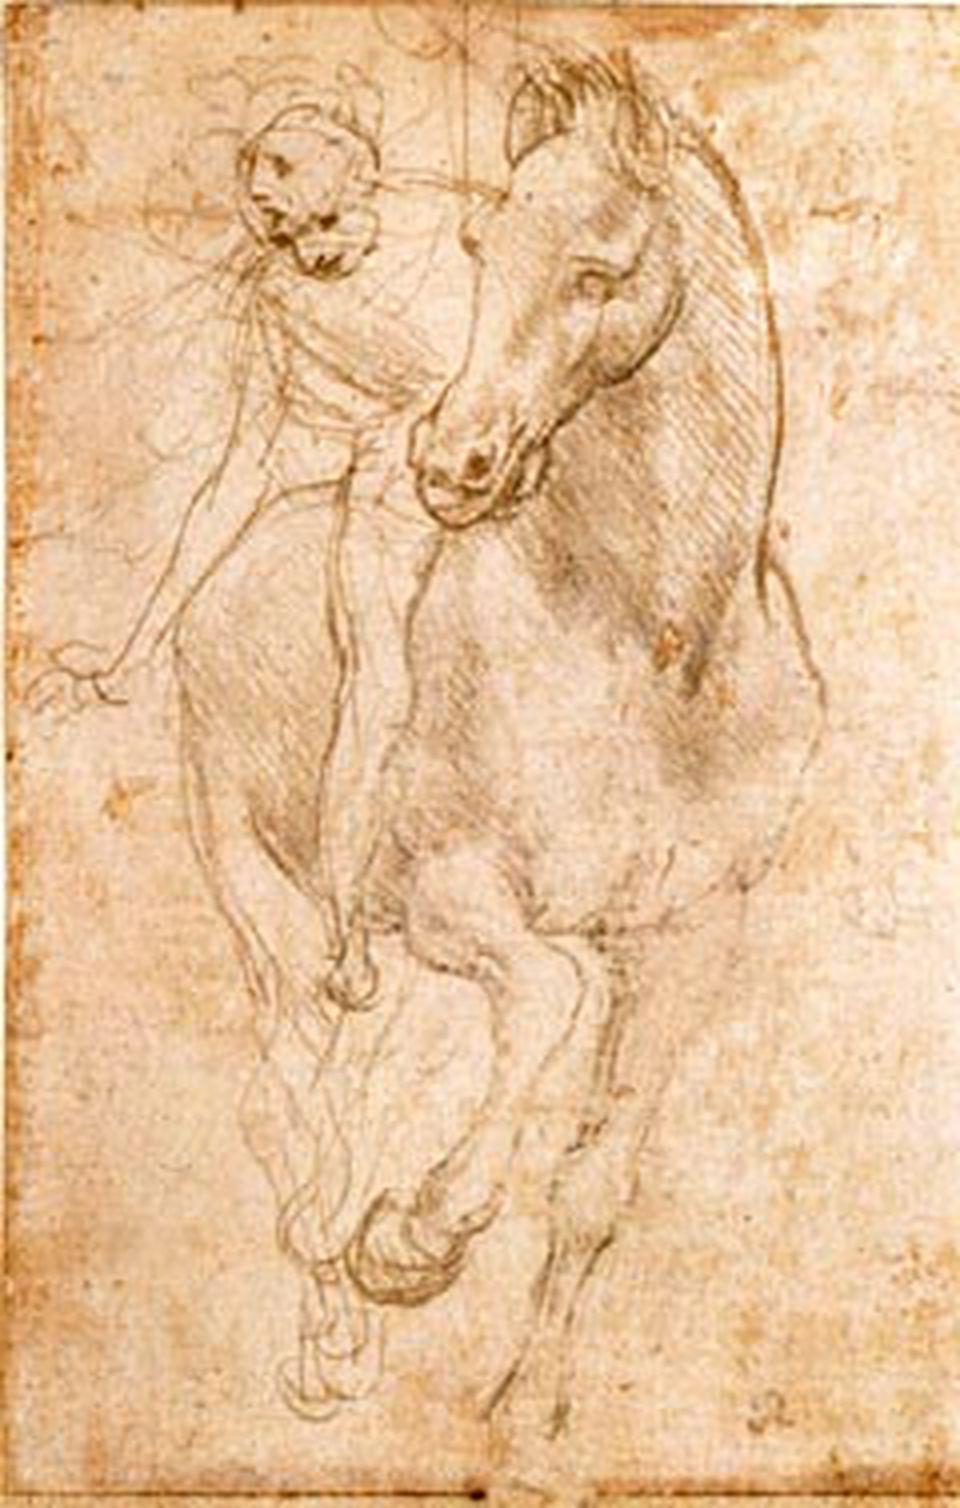 Study of Horses, Leonardo da Vinci, silverpoint